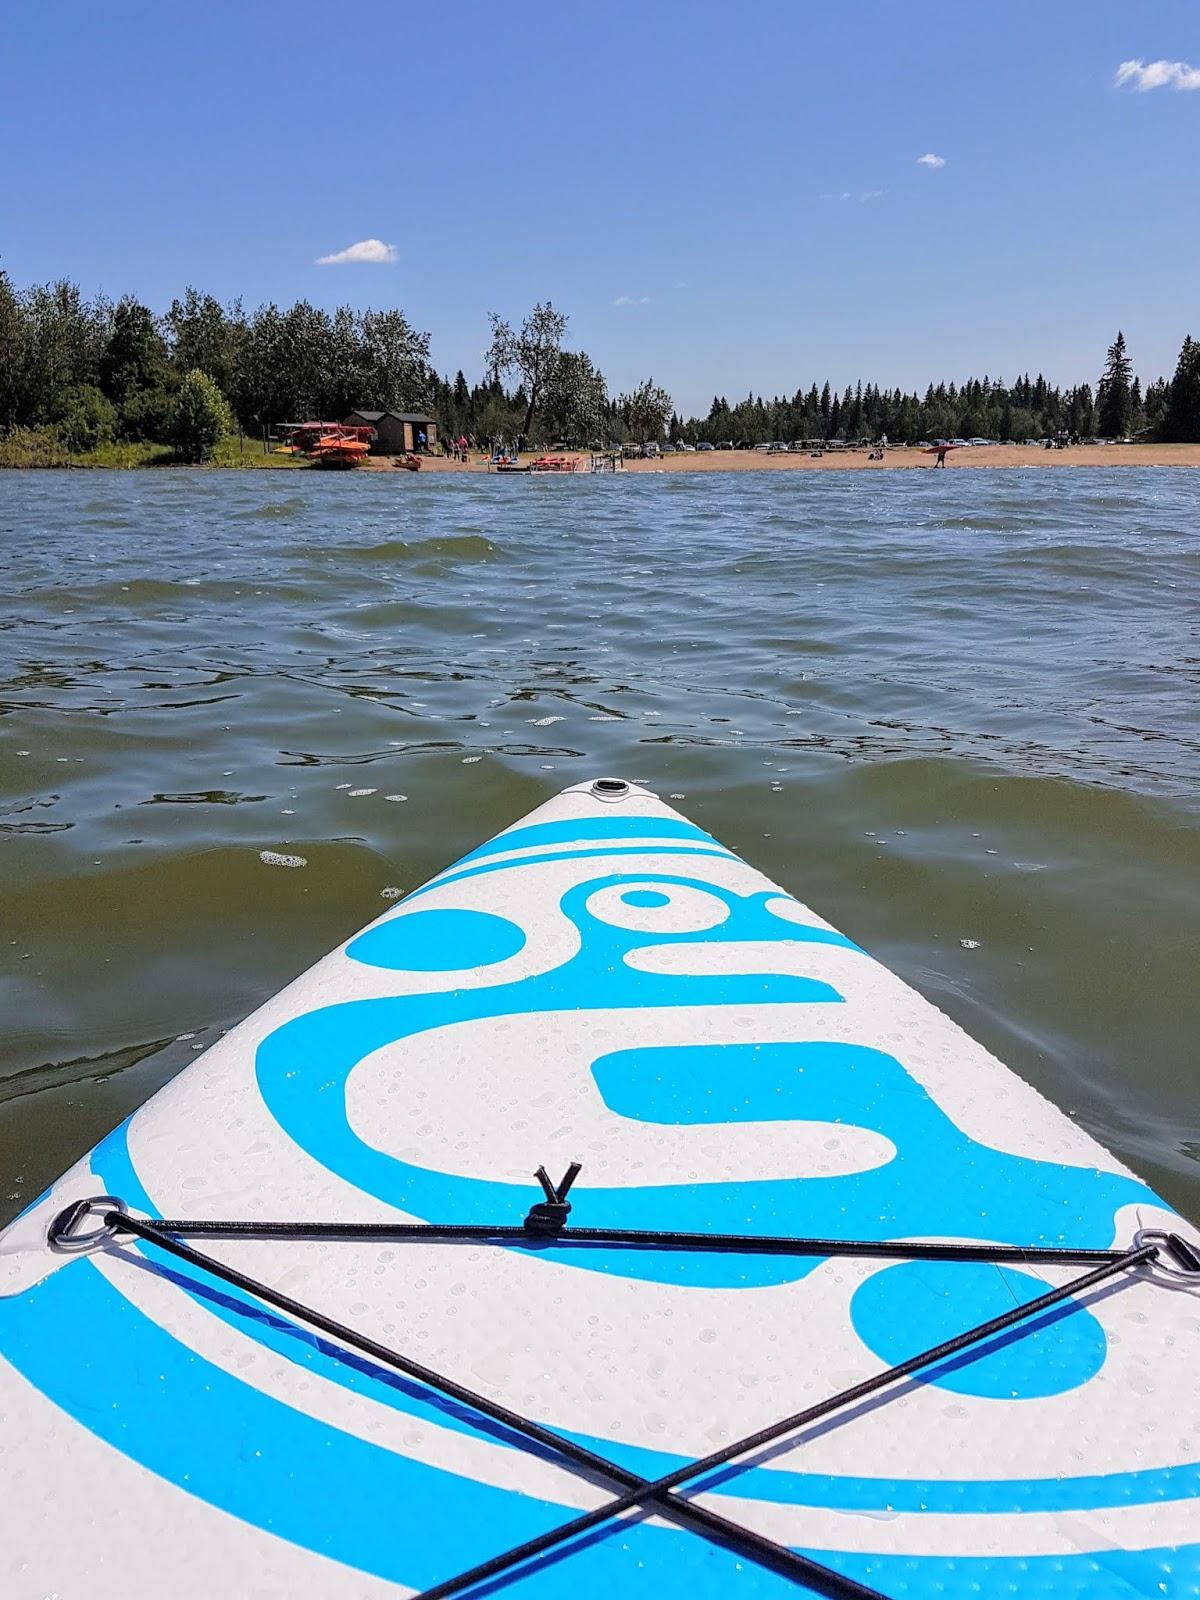 Stand up paddleboarding at Astotin Lake